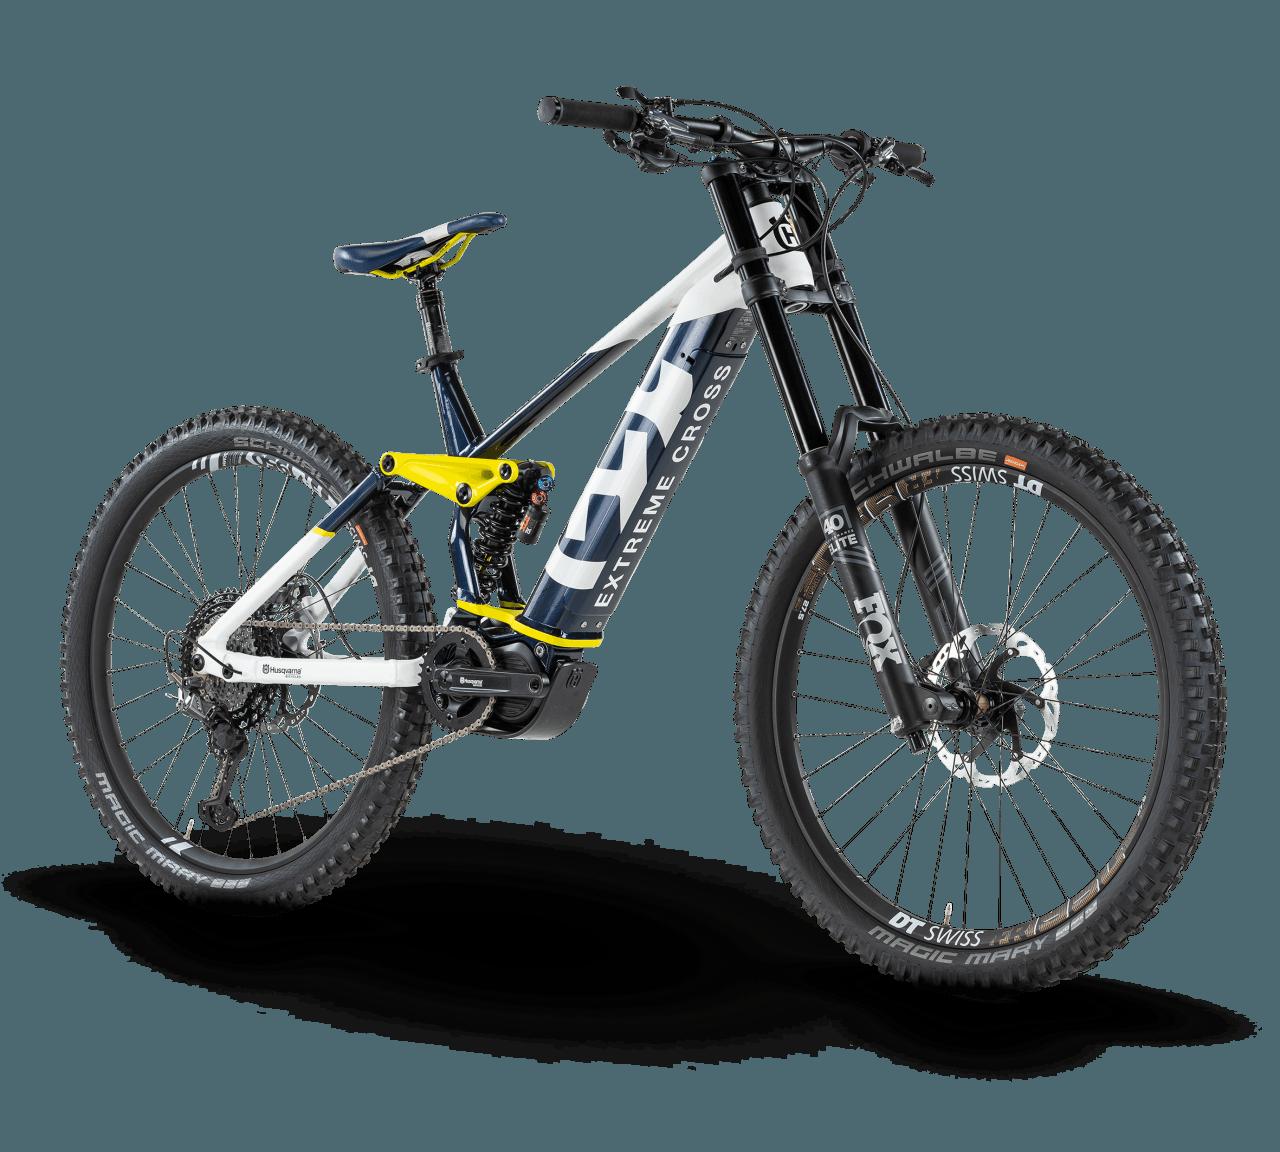 husqvarna extreme cross exc 10 e bike ebike downhill fully. Black Bedroom Furniture Sets. Home Design Ideas